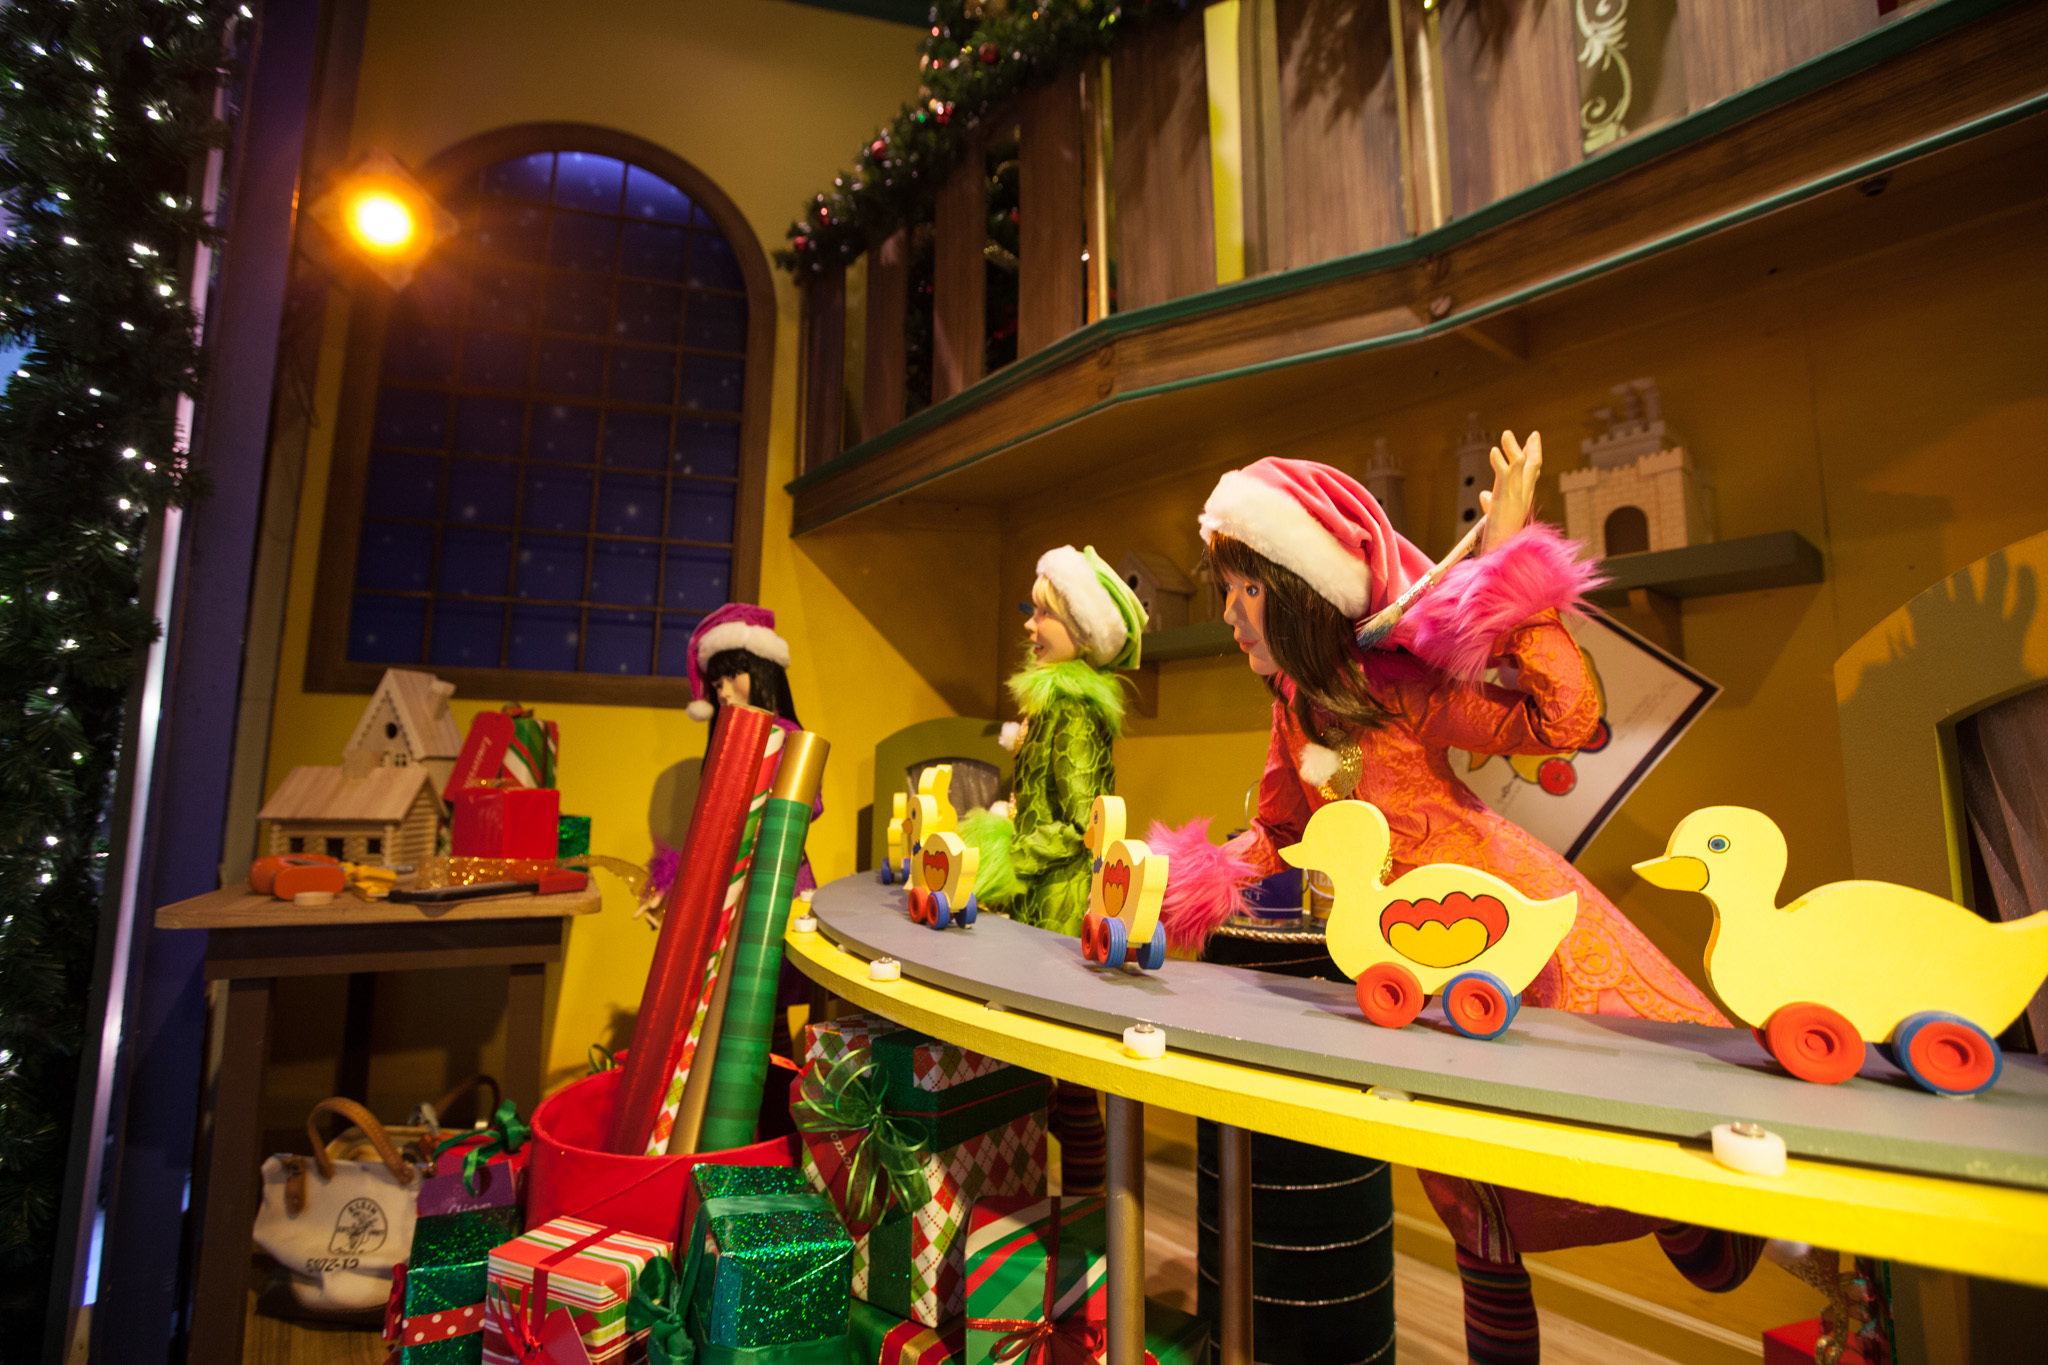 Sneak peek at Macy's 2014 holiday windows